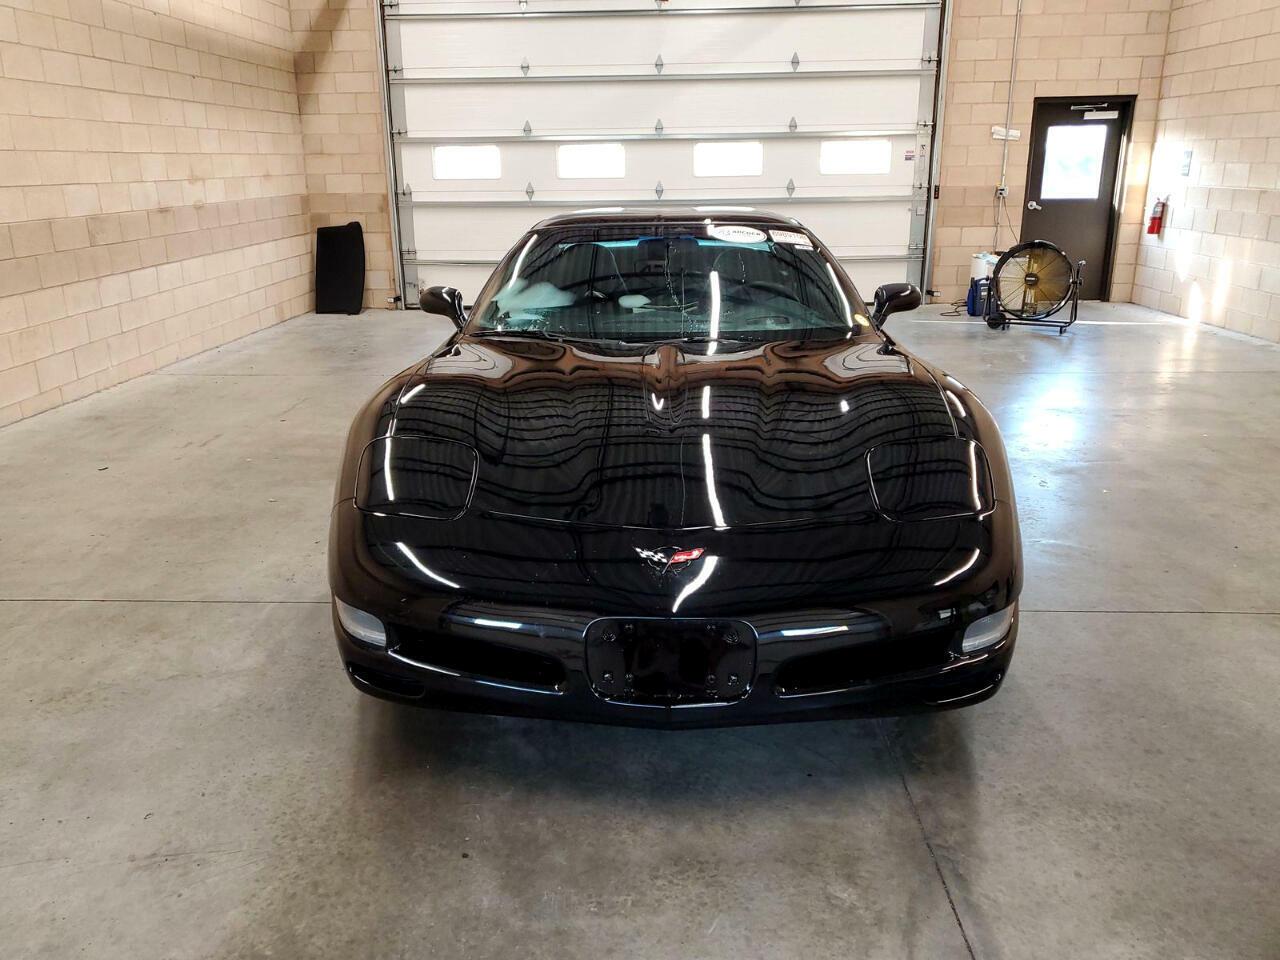 2004 Black Chevrolet Corvette Coupe  | C5 Corvette Photo 2